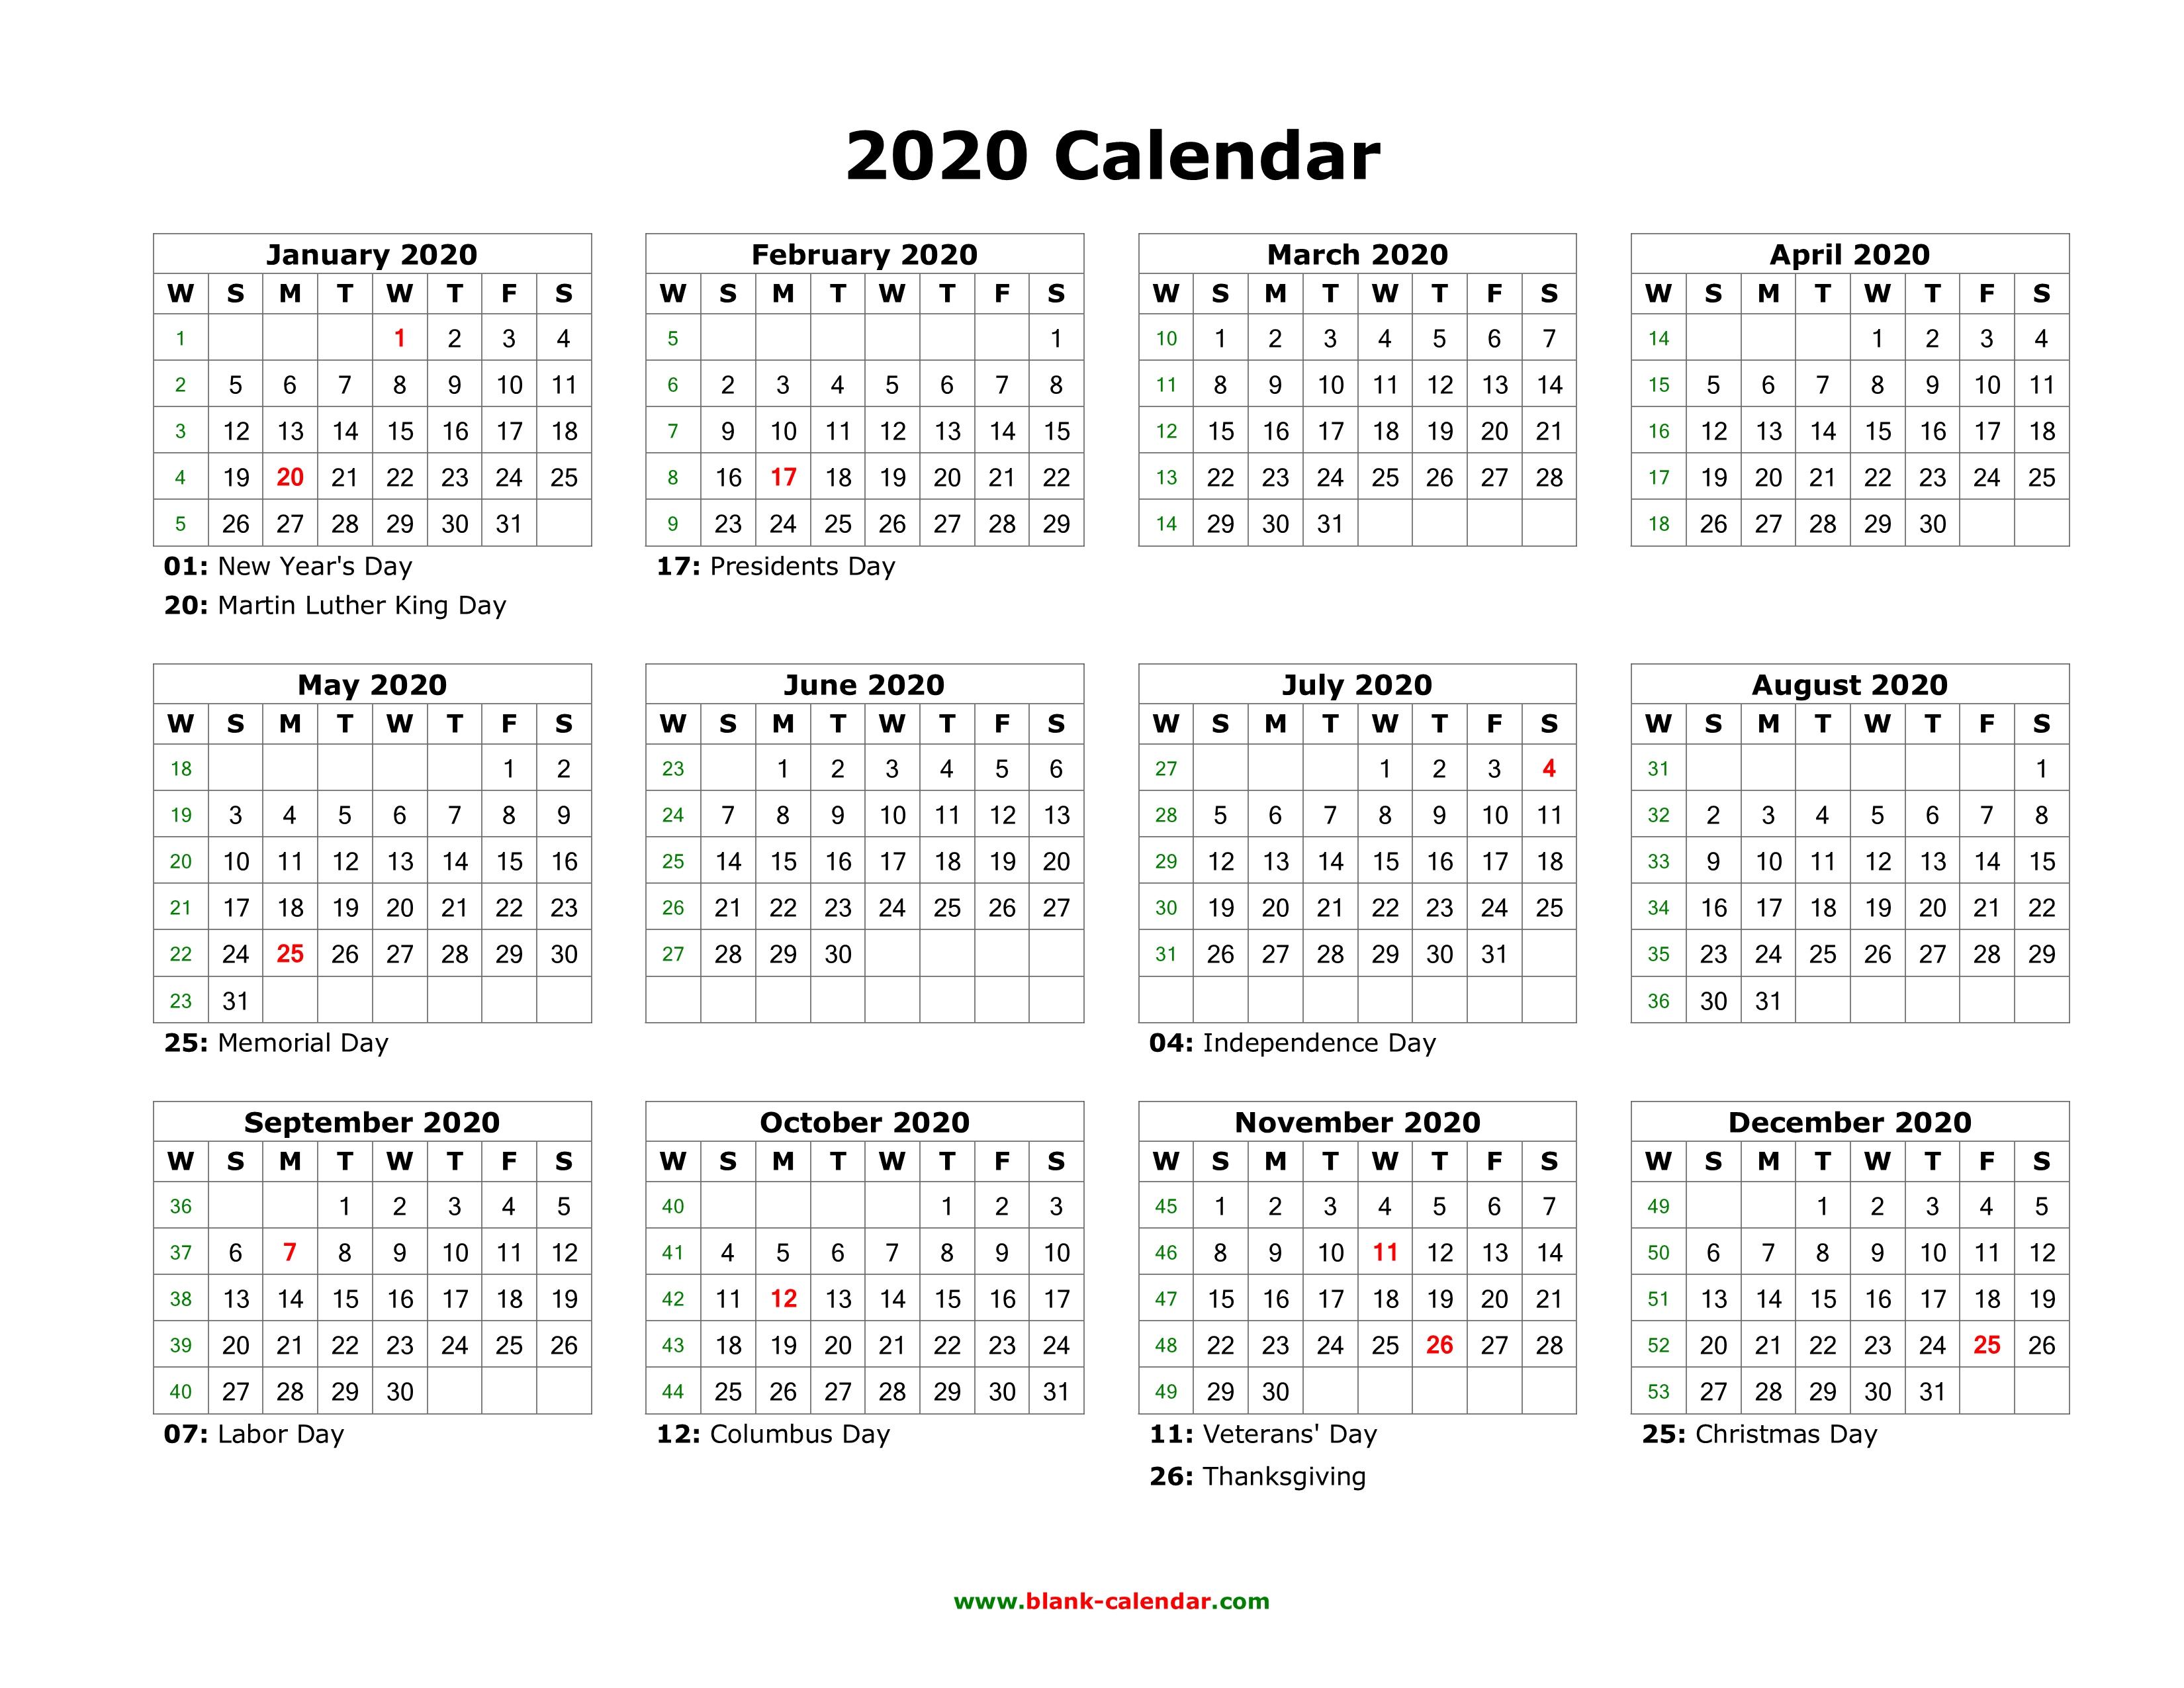 Blank Calendar 2020 | Free Download Calendar Templates for Google Calendar Printable 2019 2020